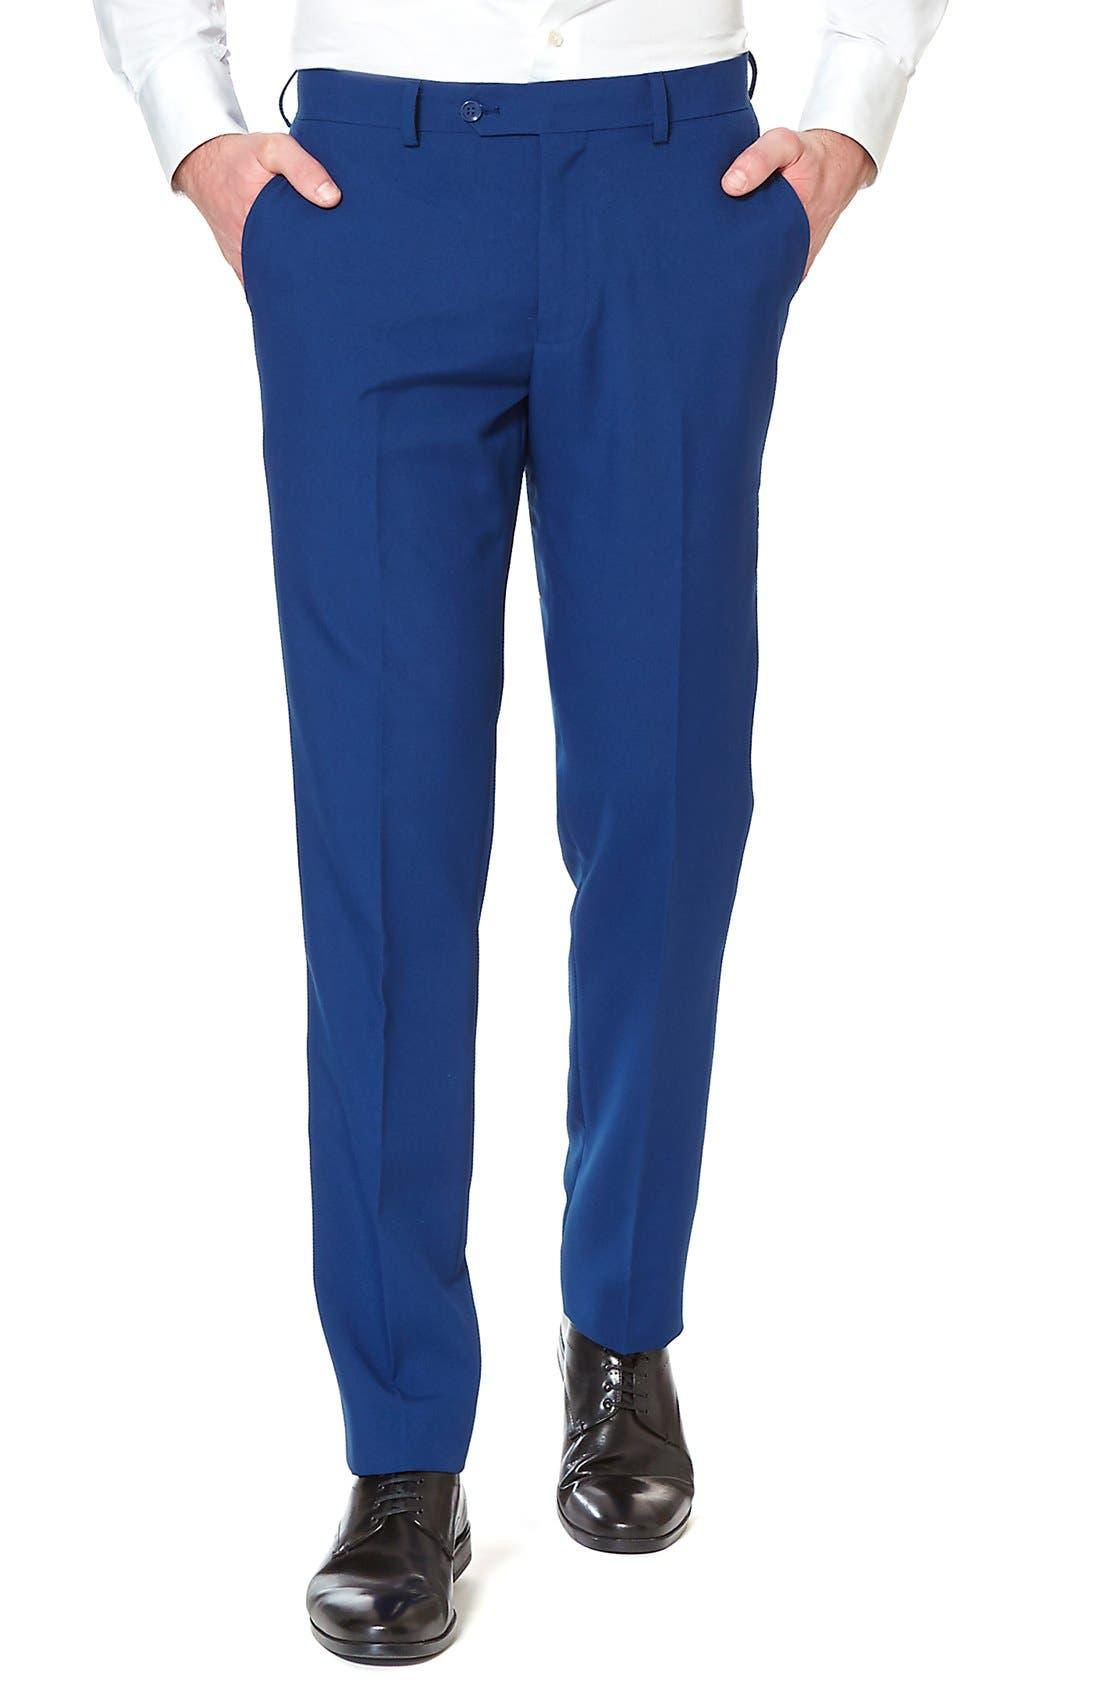 'Navy Royale' Trim Fit Two-Piece Suit with Tie,                             Alternate thumbnail 4, color,                             410